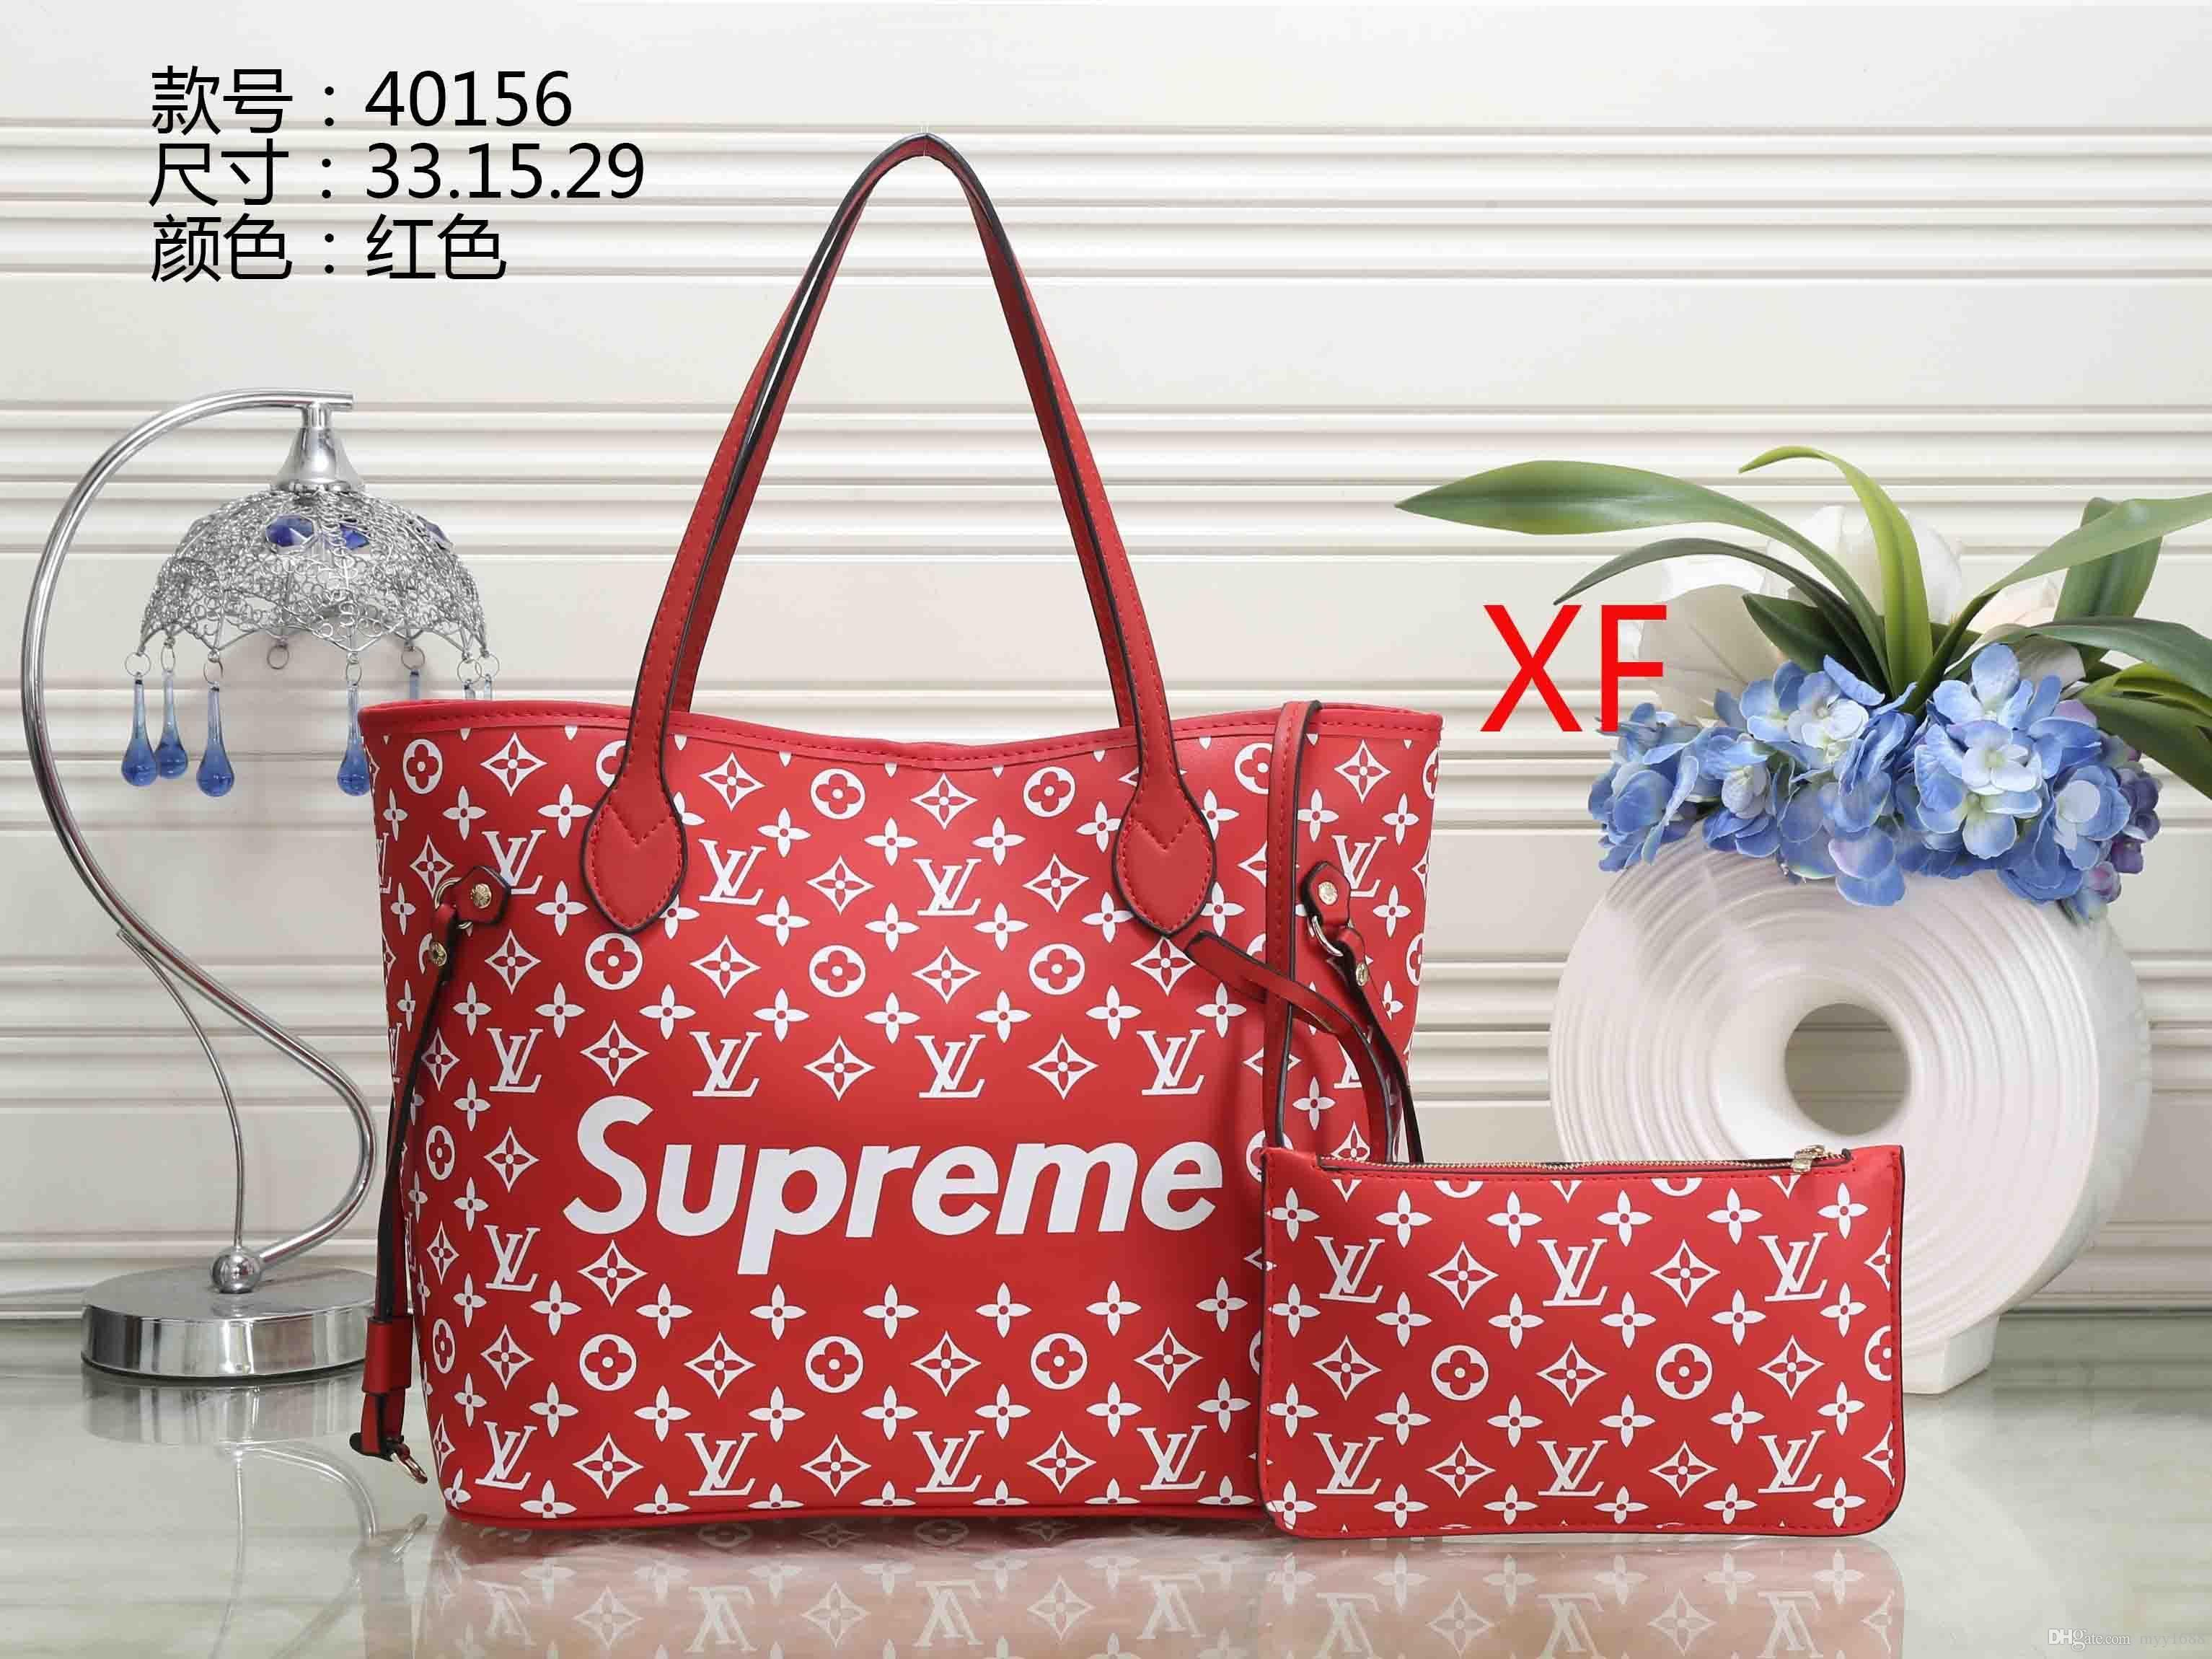 b0c9cdb99cb 2019 NEW styles Fashion Bags Ladies handbags designer bags women tote bag  Single shoulder bag backpack wallet Free shipping 5255